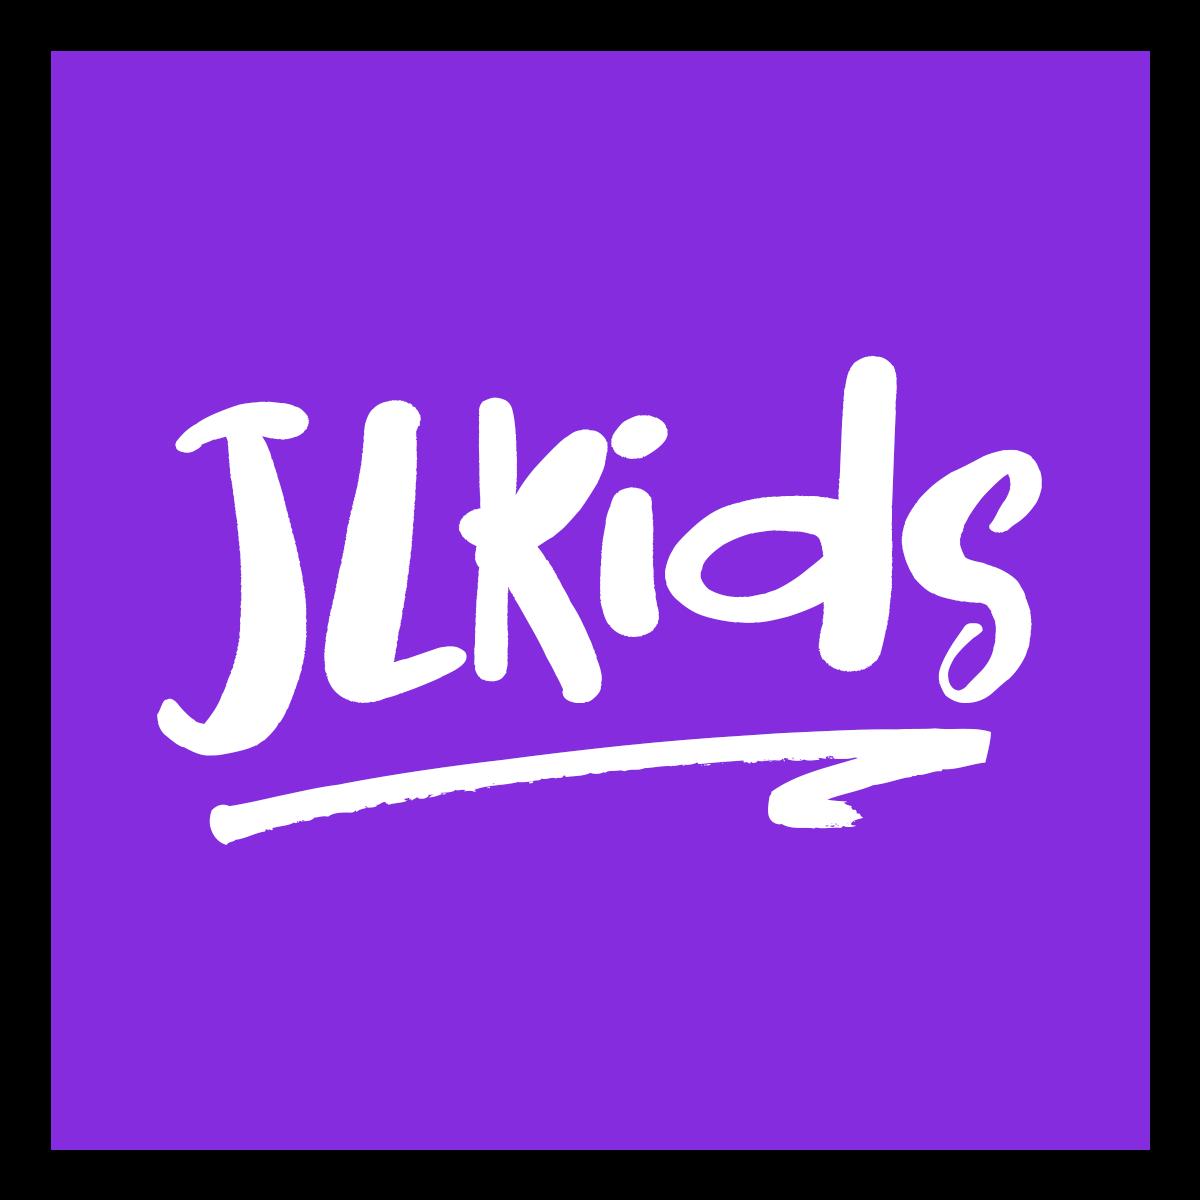 jl kids